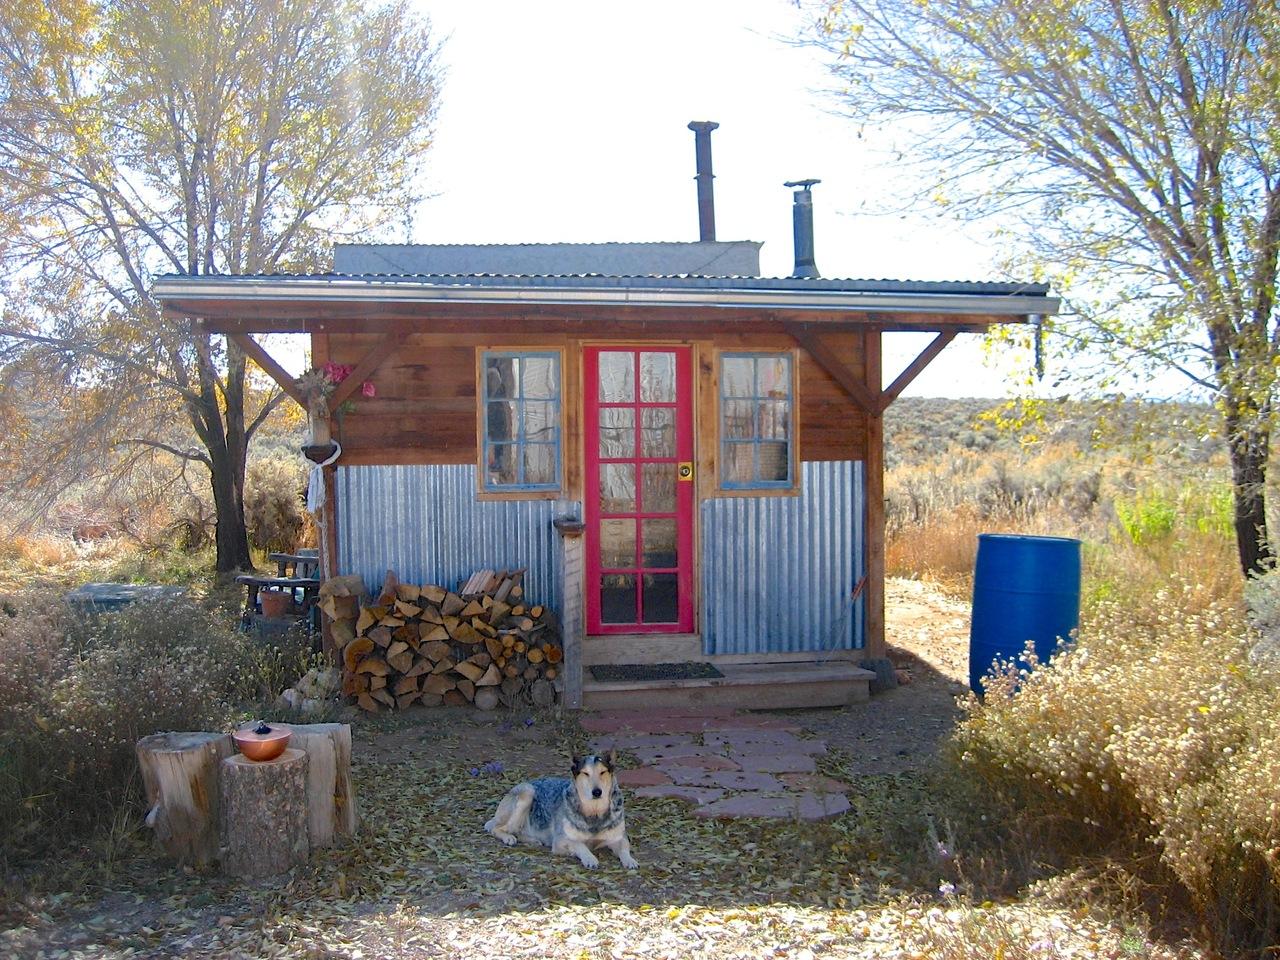 A homestead near Taos, New Mexico.